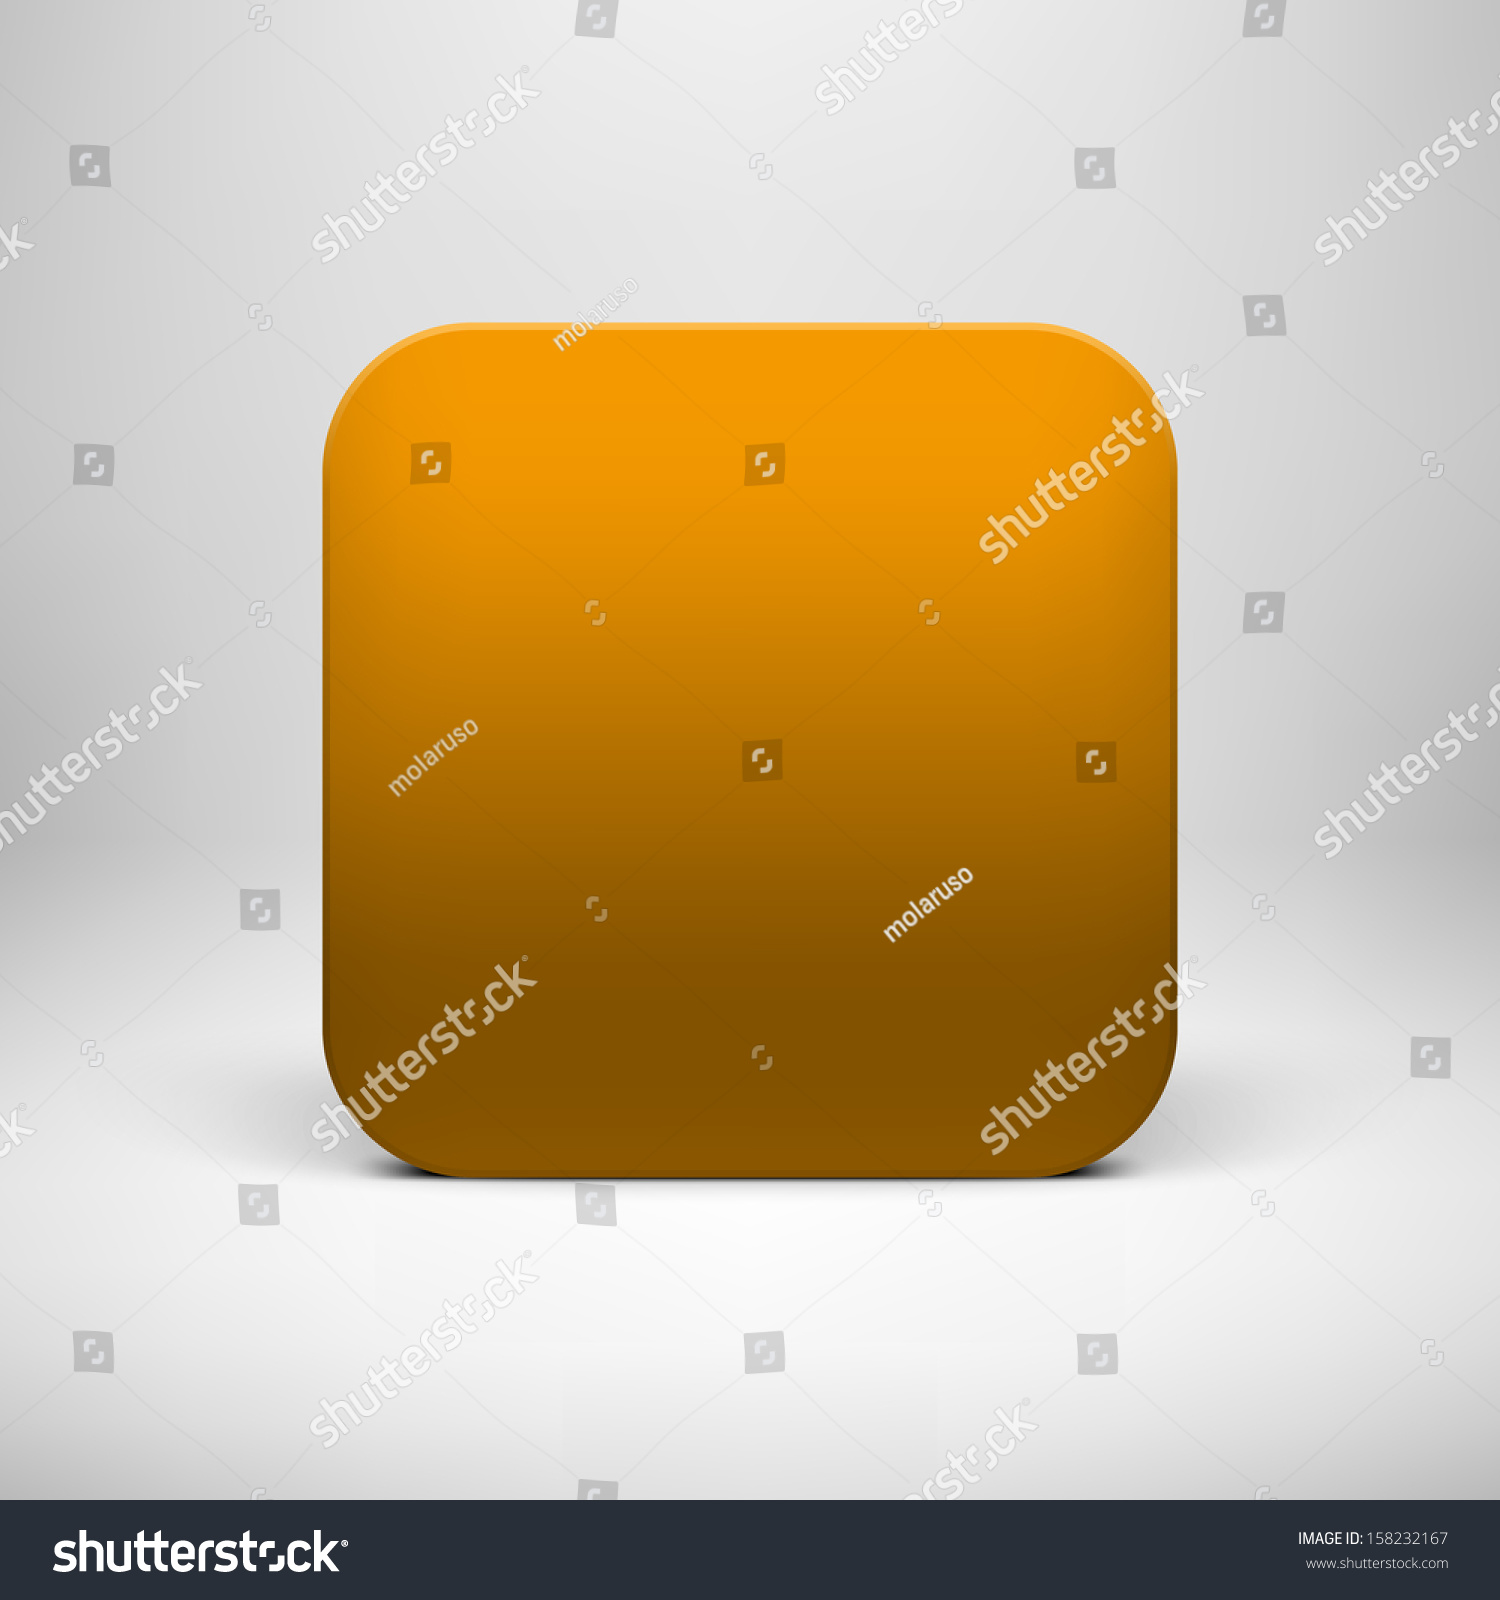 ligg app yellow